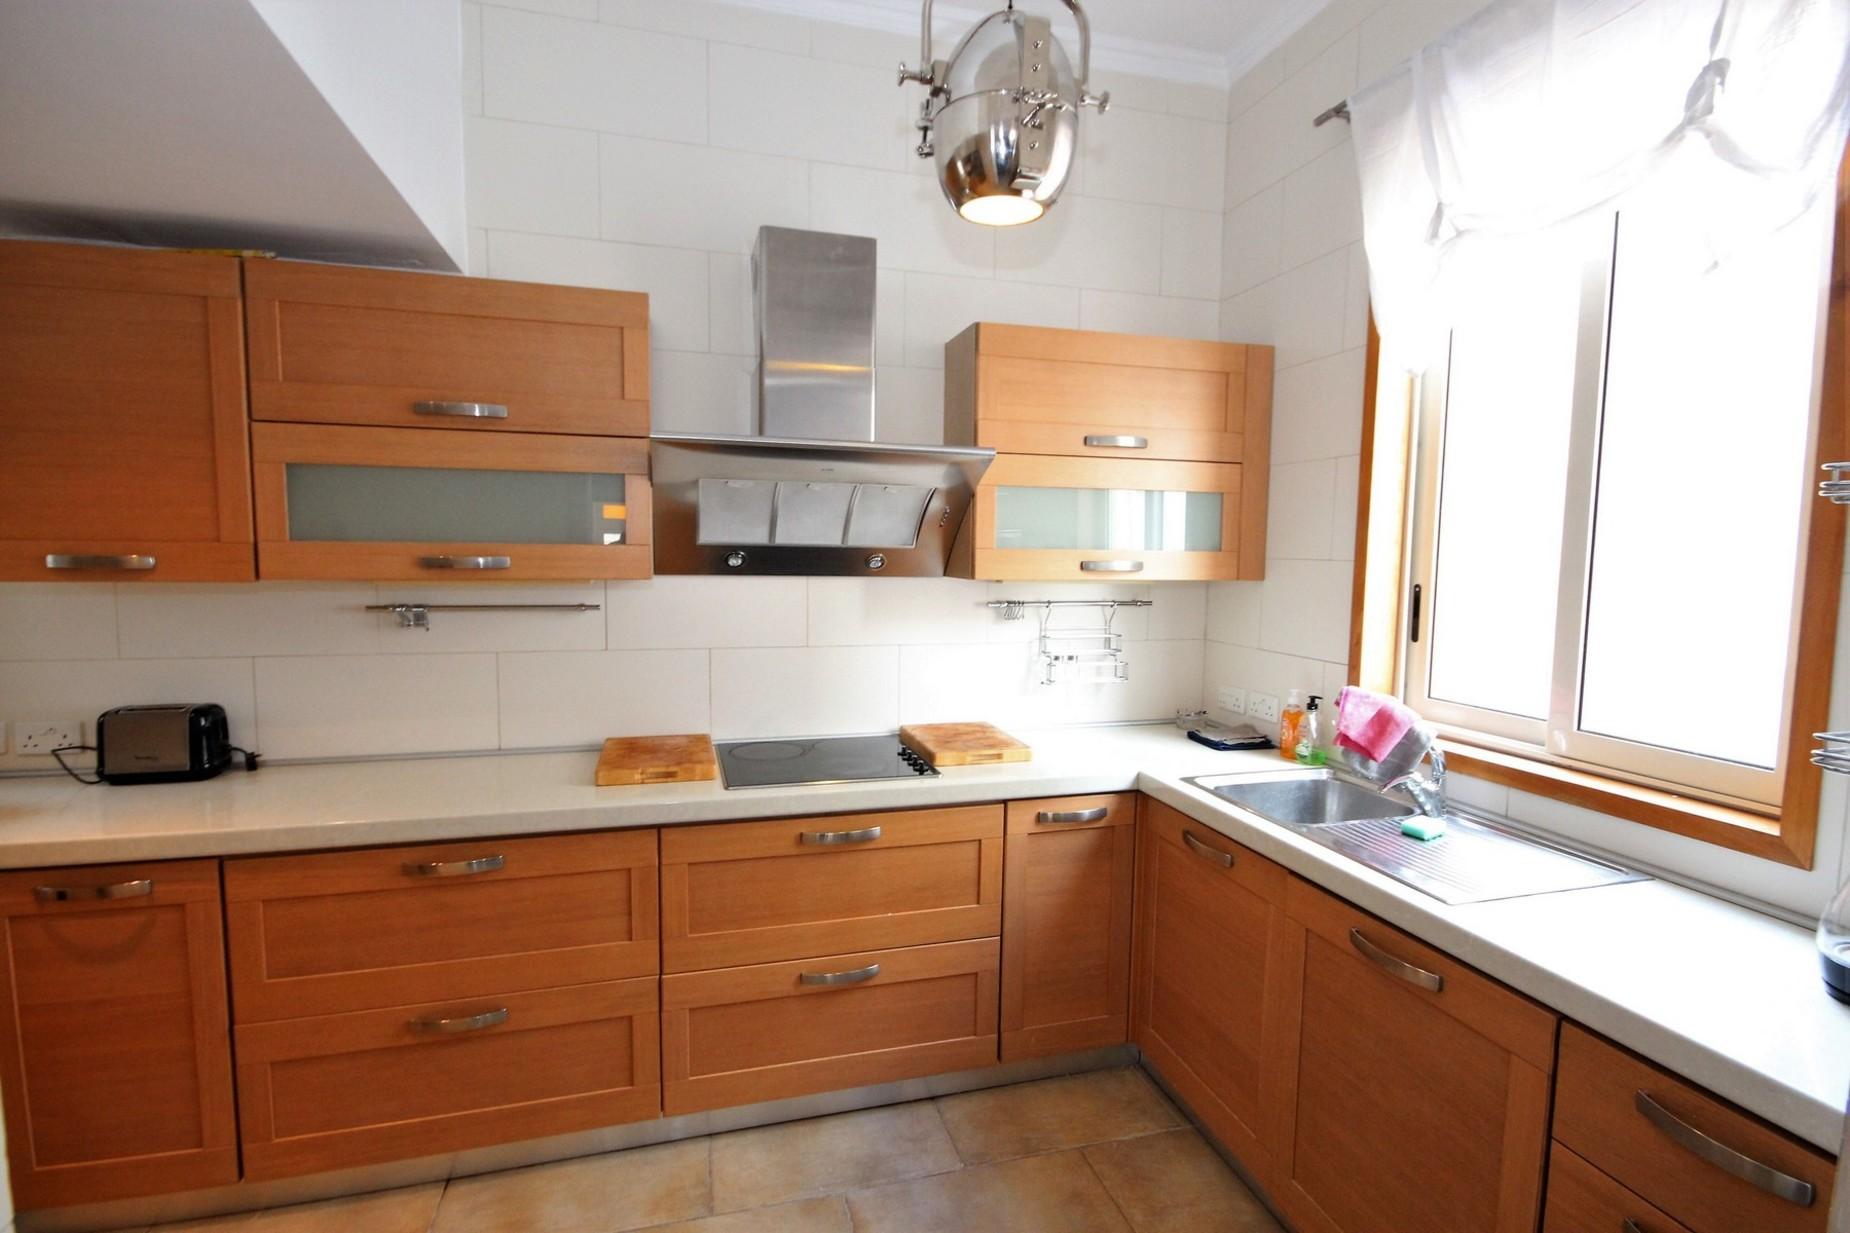 3 bed Town House For Rent in Gzira, Gzira - thumb 5